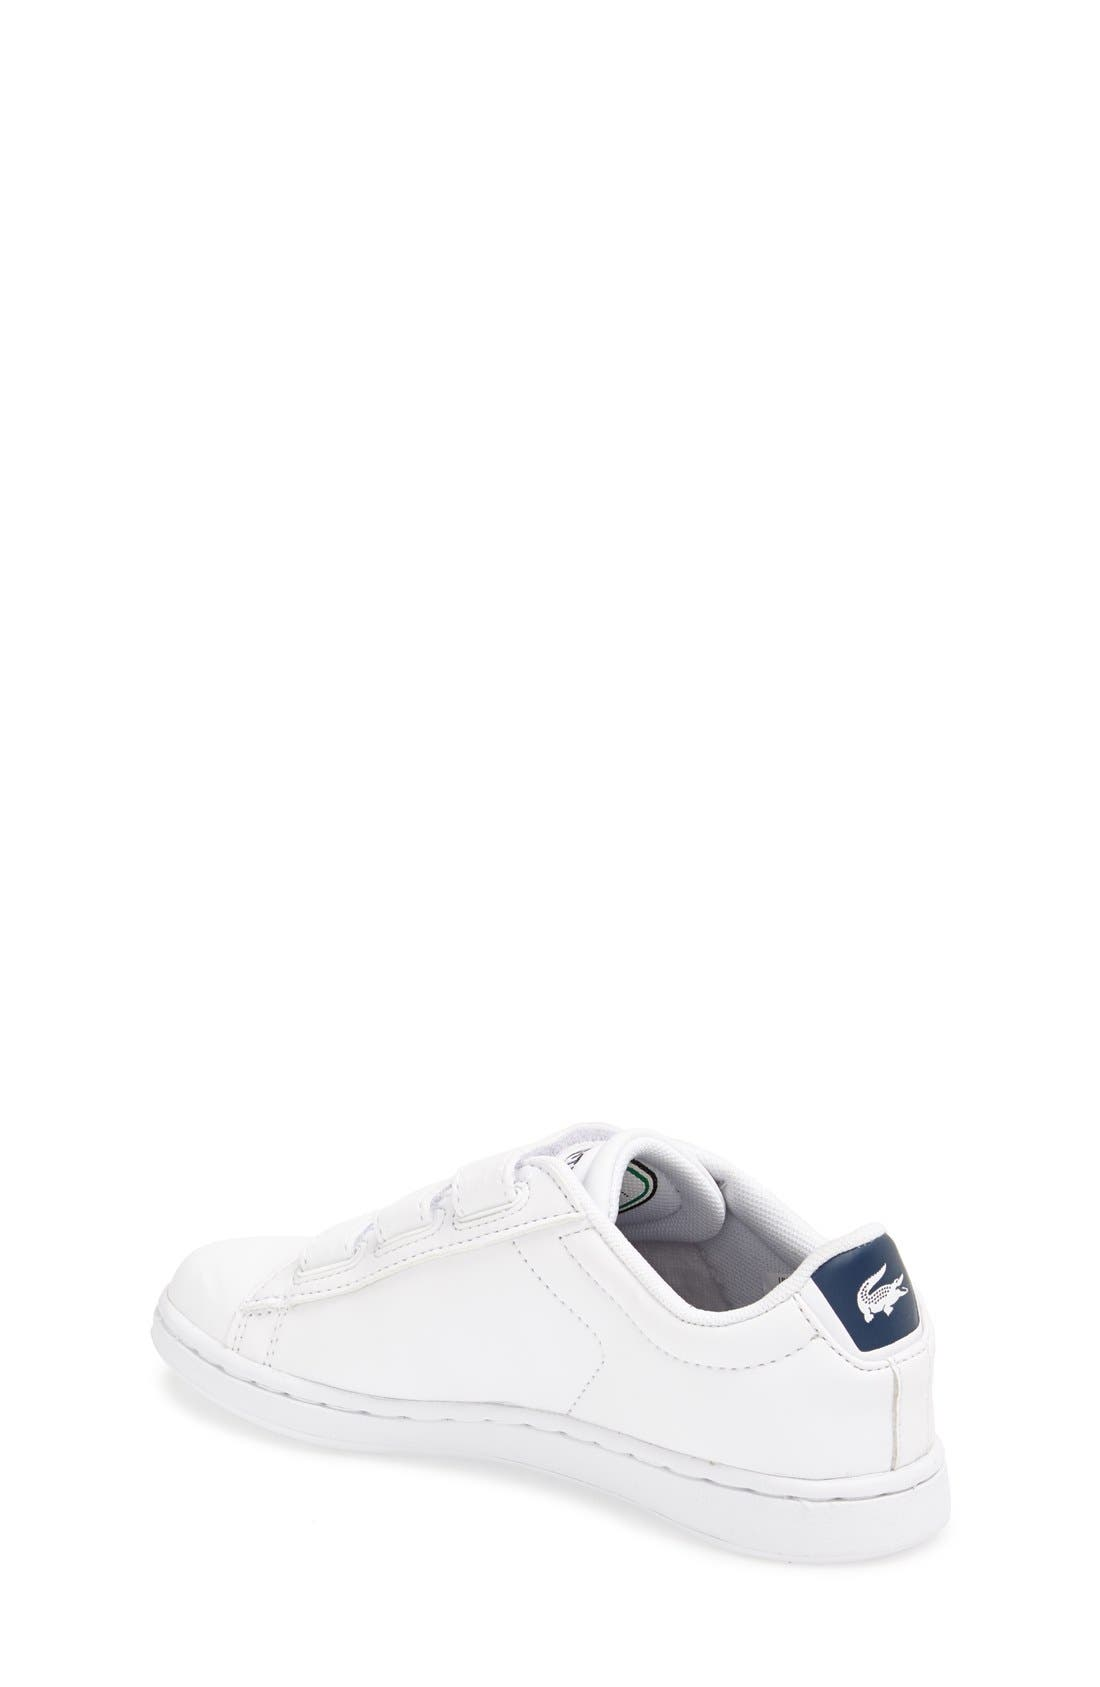 Alternate Image 2  - Lacoste 'Carnaby' Sneaker (Toddler & Little Kid)